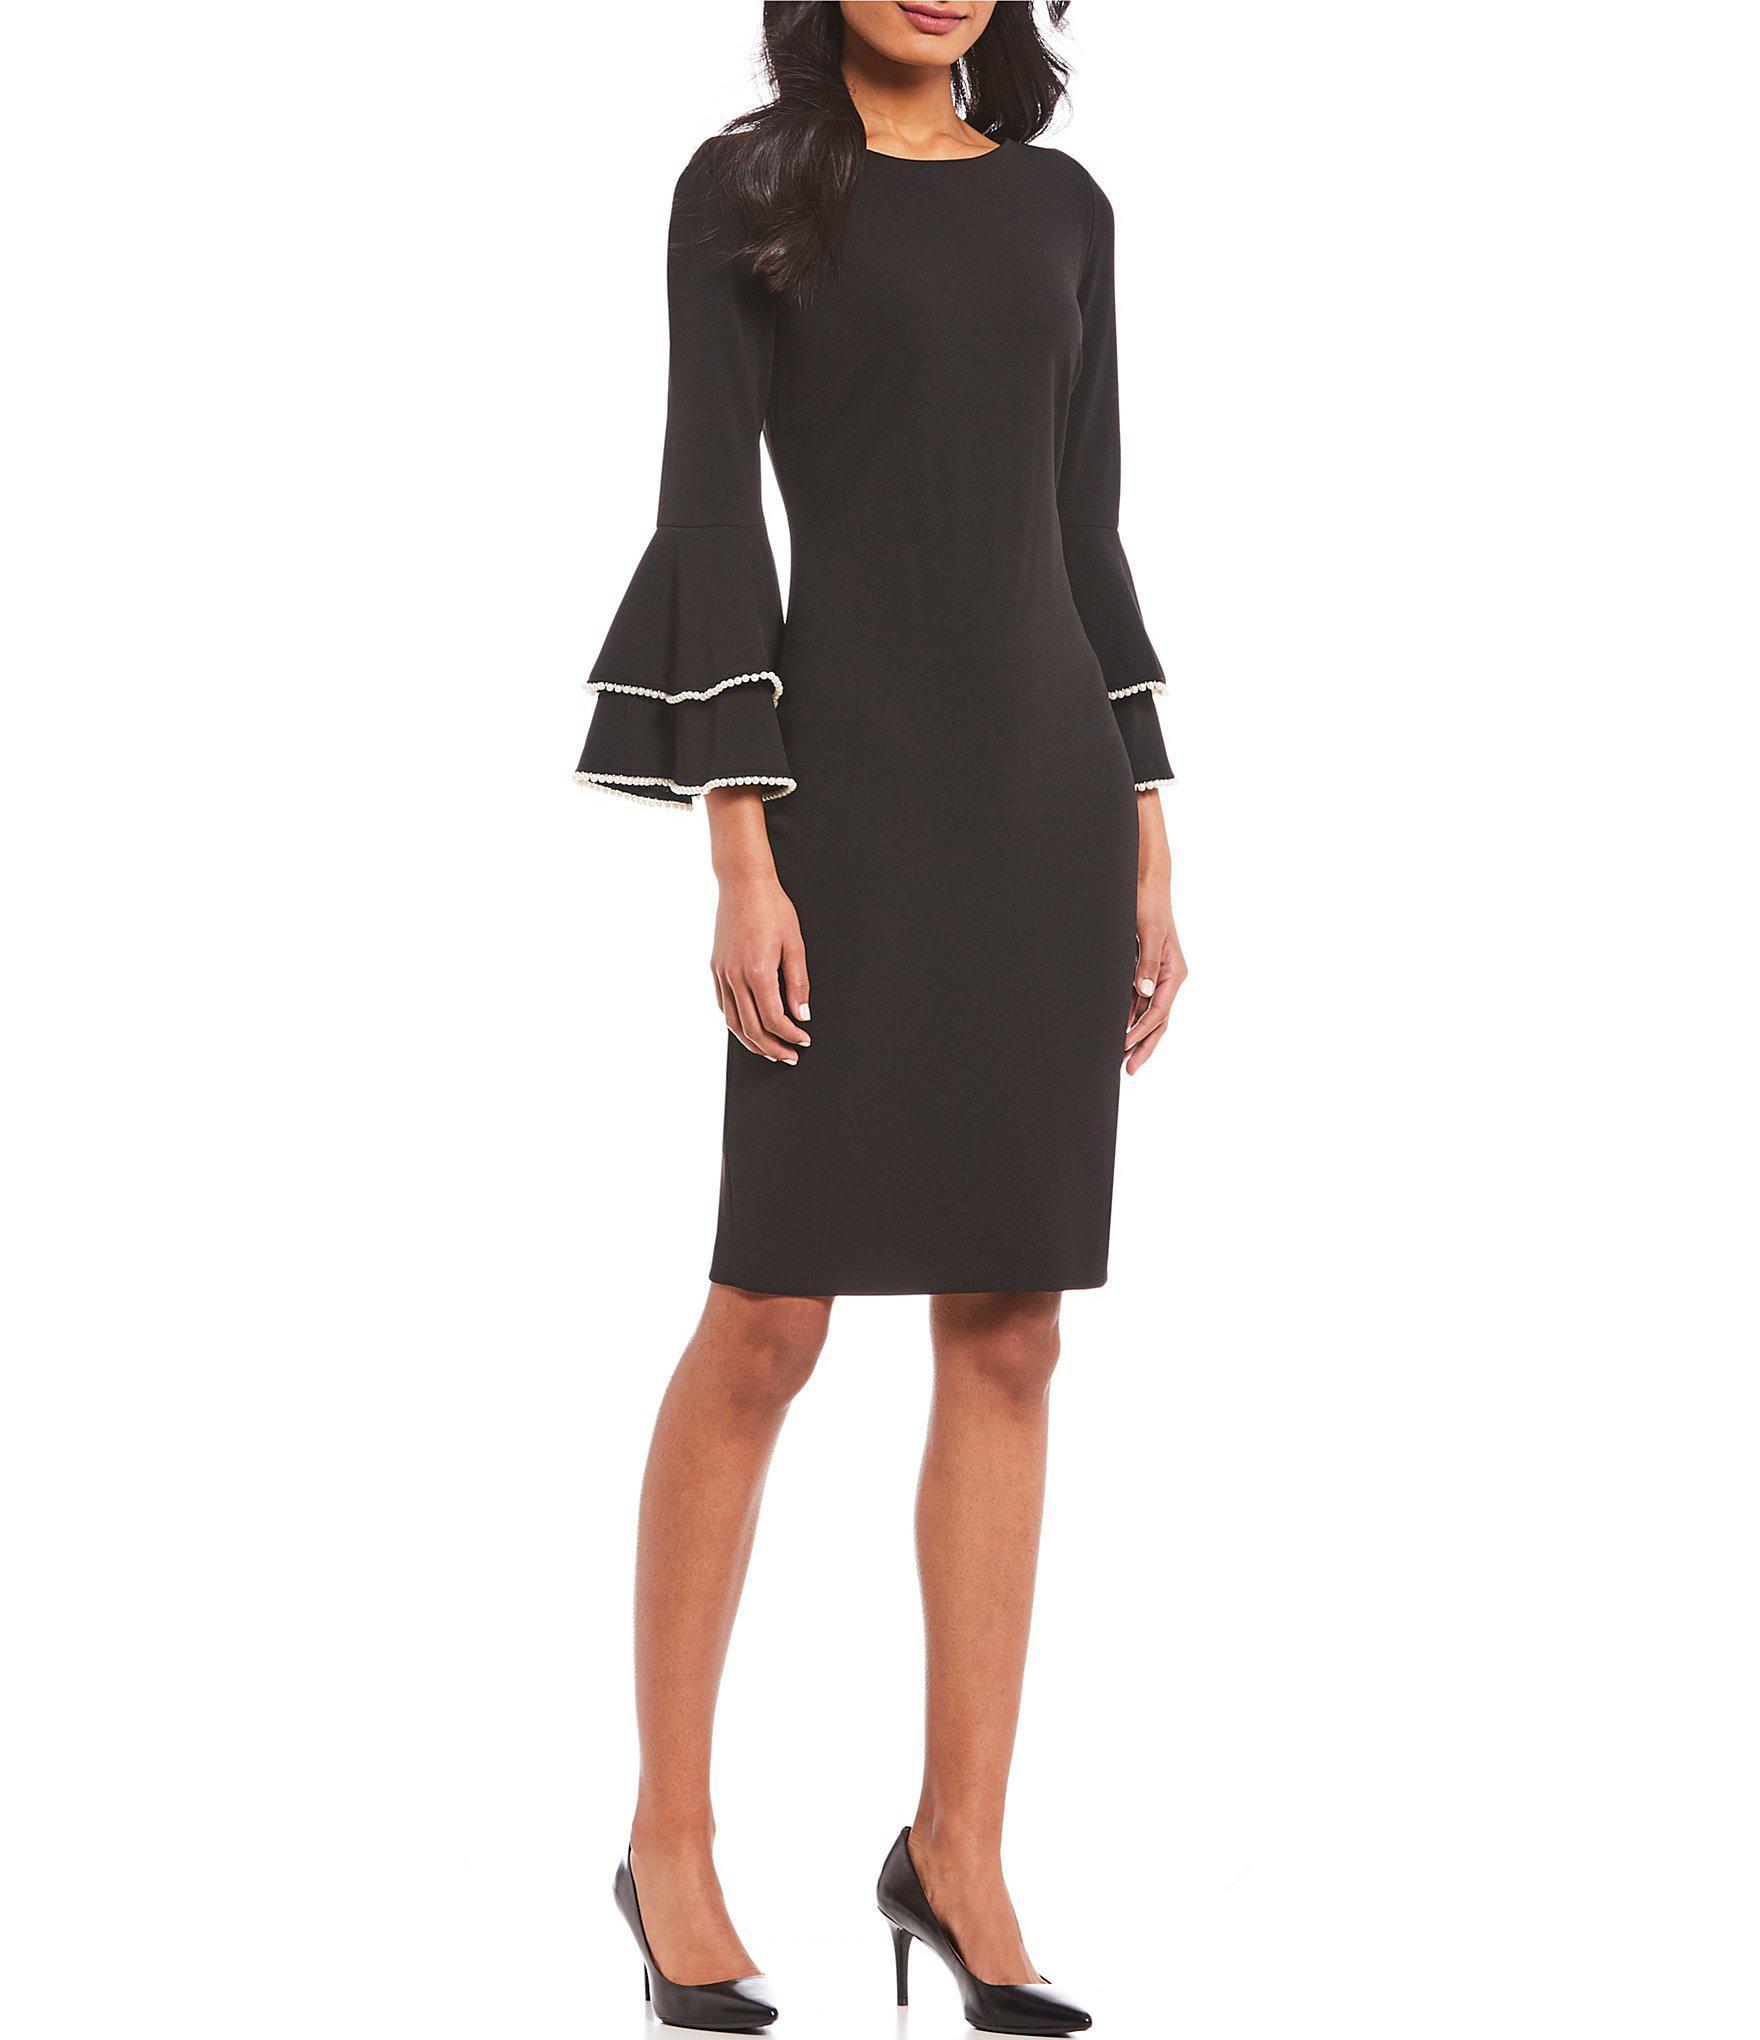 795dd5bedbe Calvin Klein. Women's Black 3/4 Sleeve Double Tiered Bell Sleeve Sheath  Dress